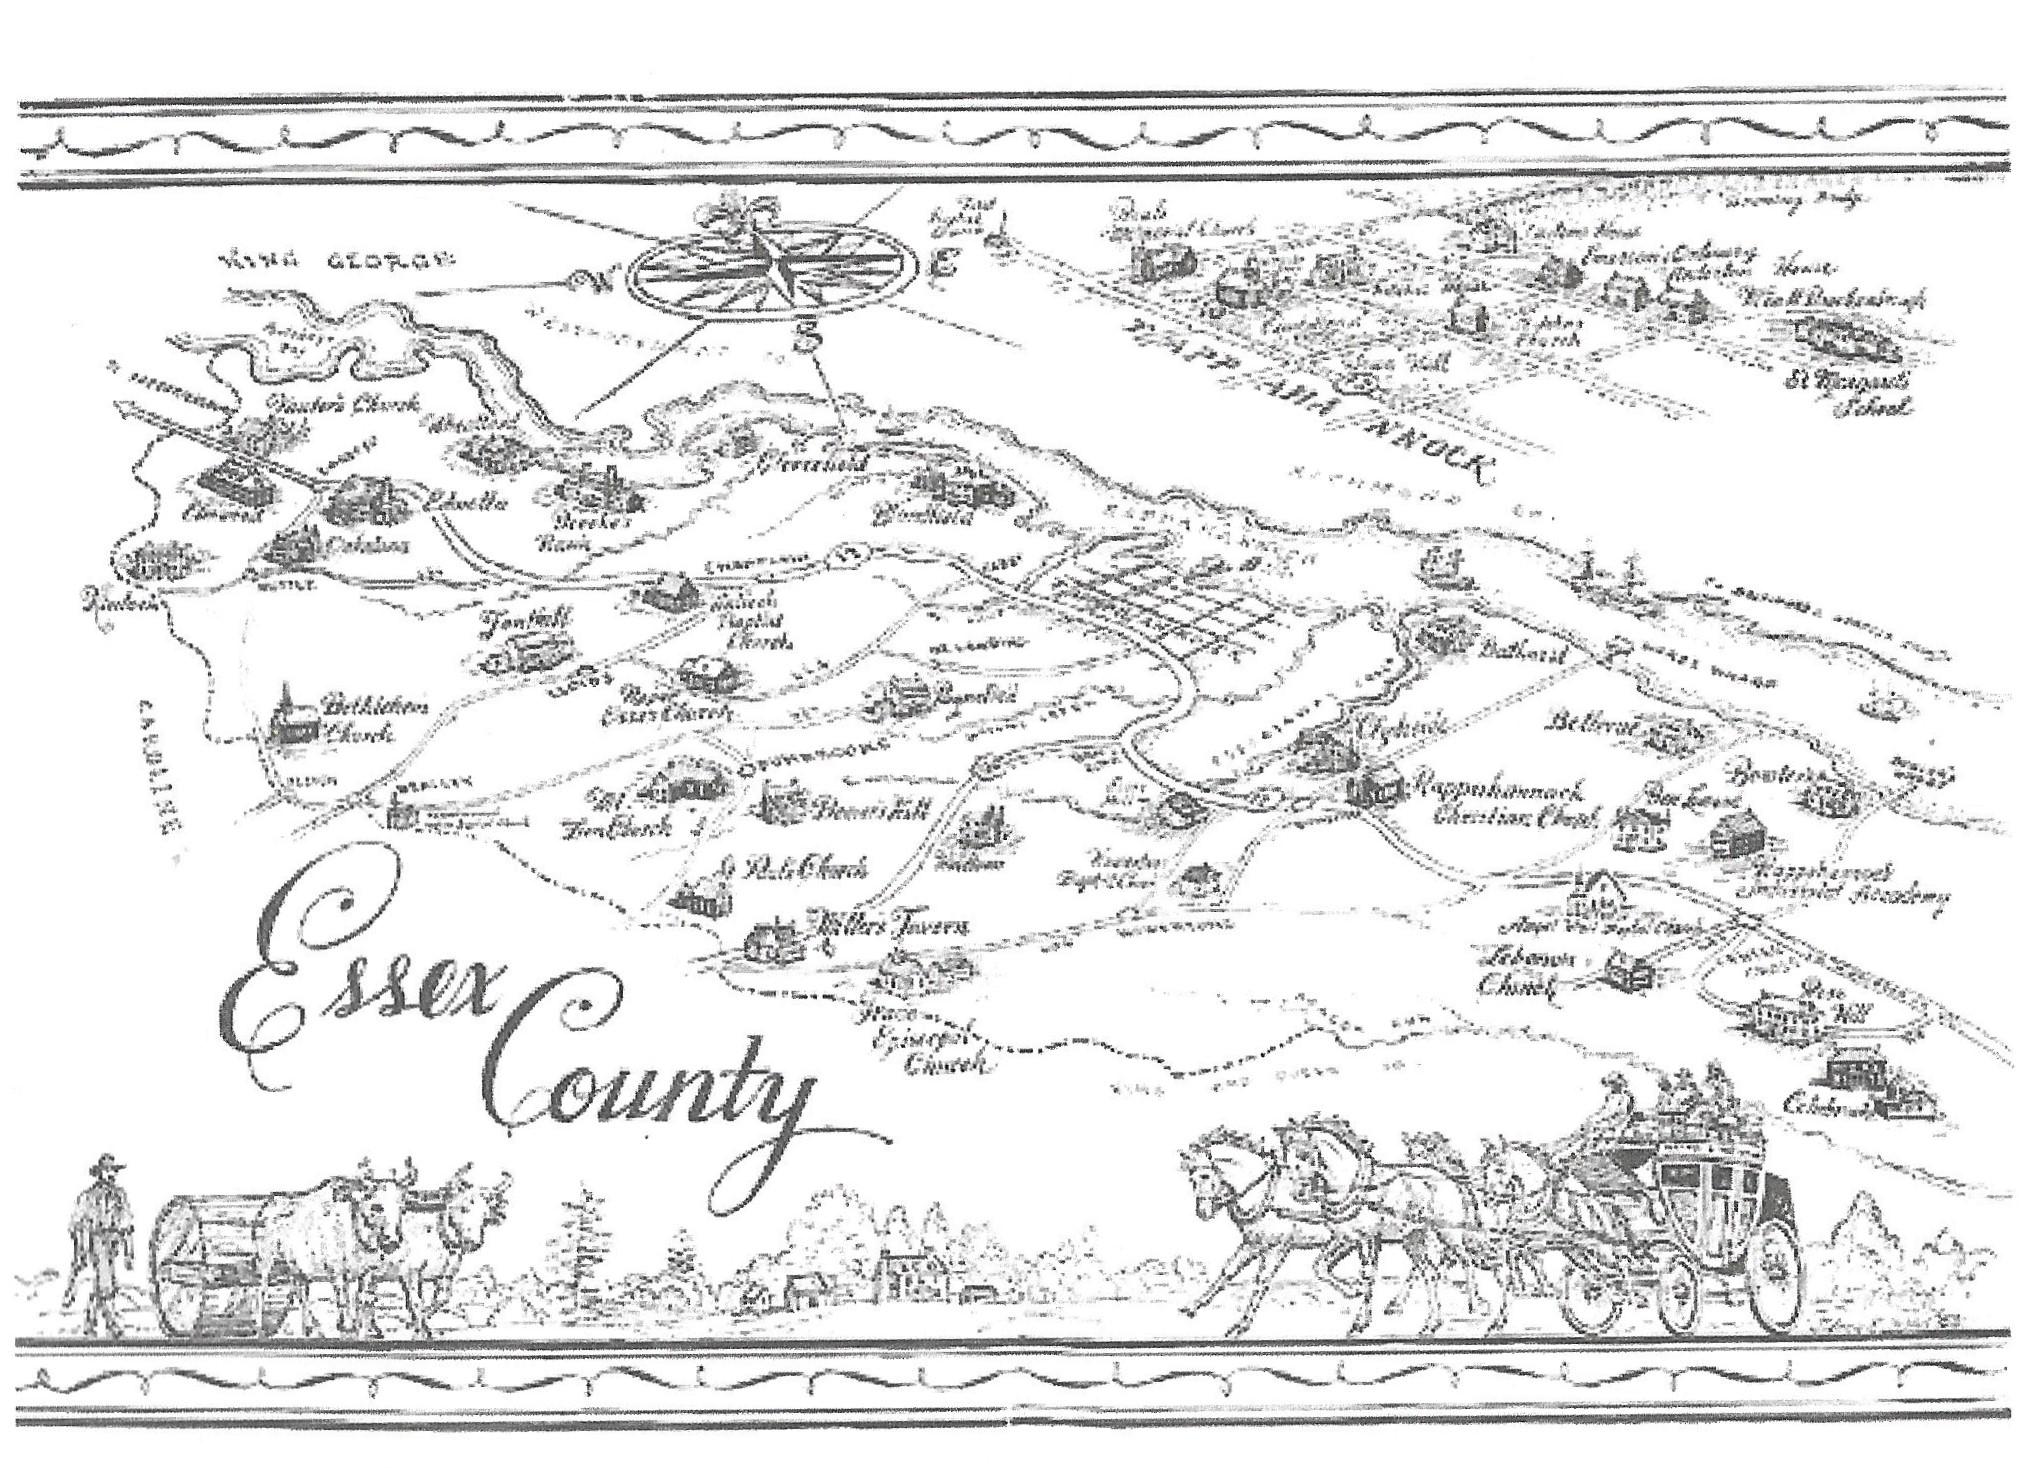 Essex County VA in 1700s 001